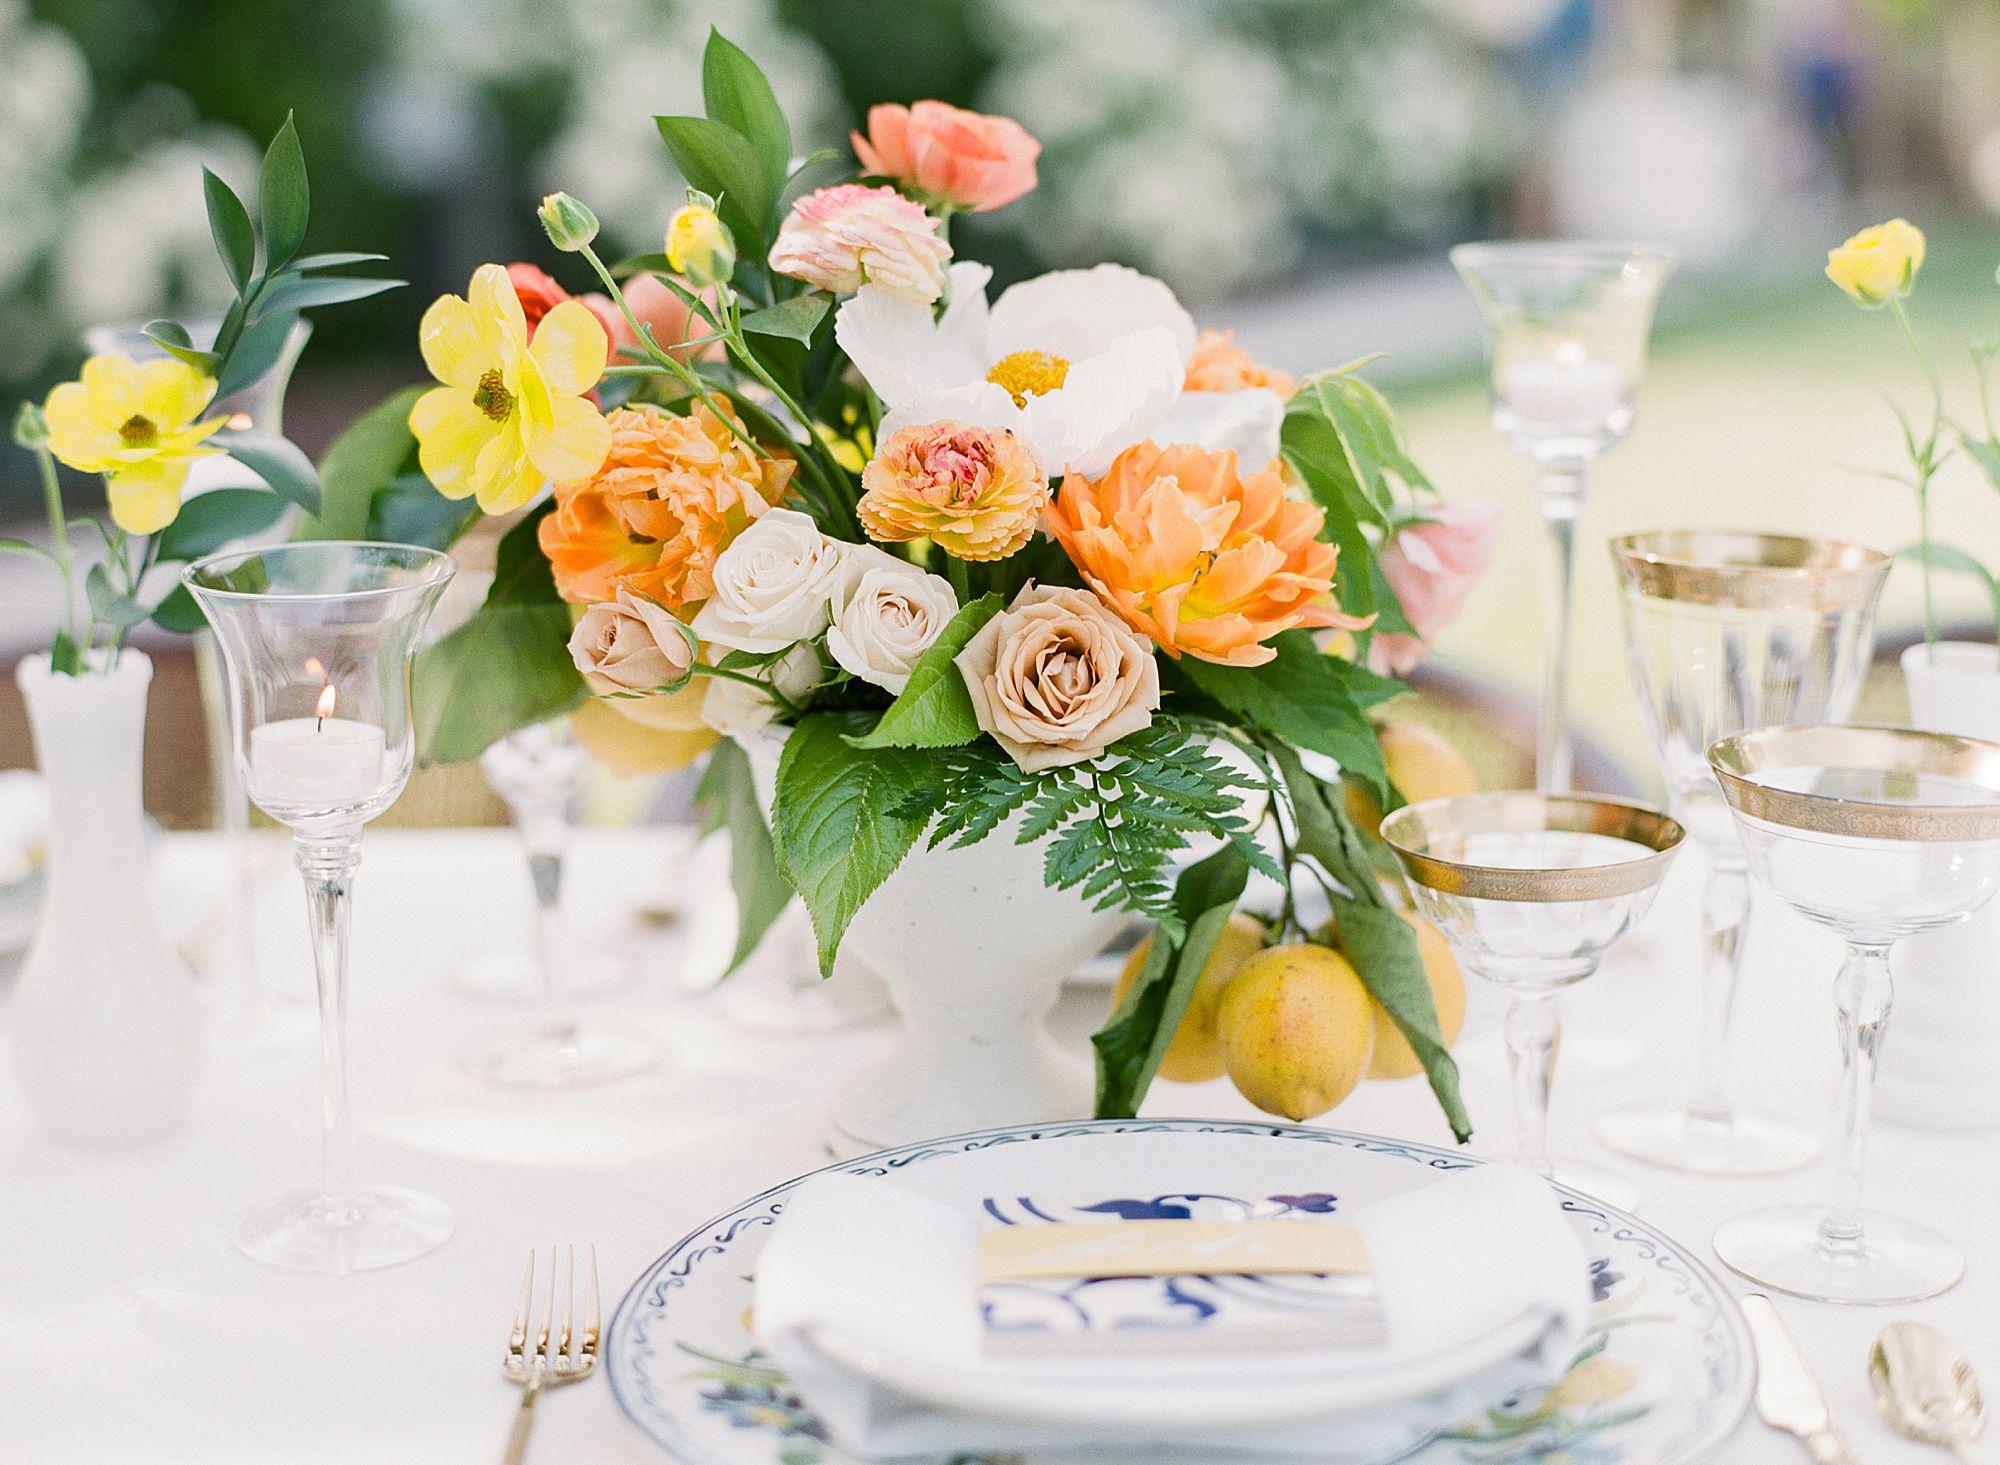 Italian Wedding Inspiration at The Maples Wedding & Event Center - Featured on Wedding Chicks - Ashley Baumgartner - Sacramento Wedding Phtoographer_0043.jpg